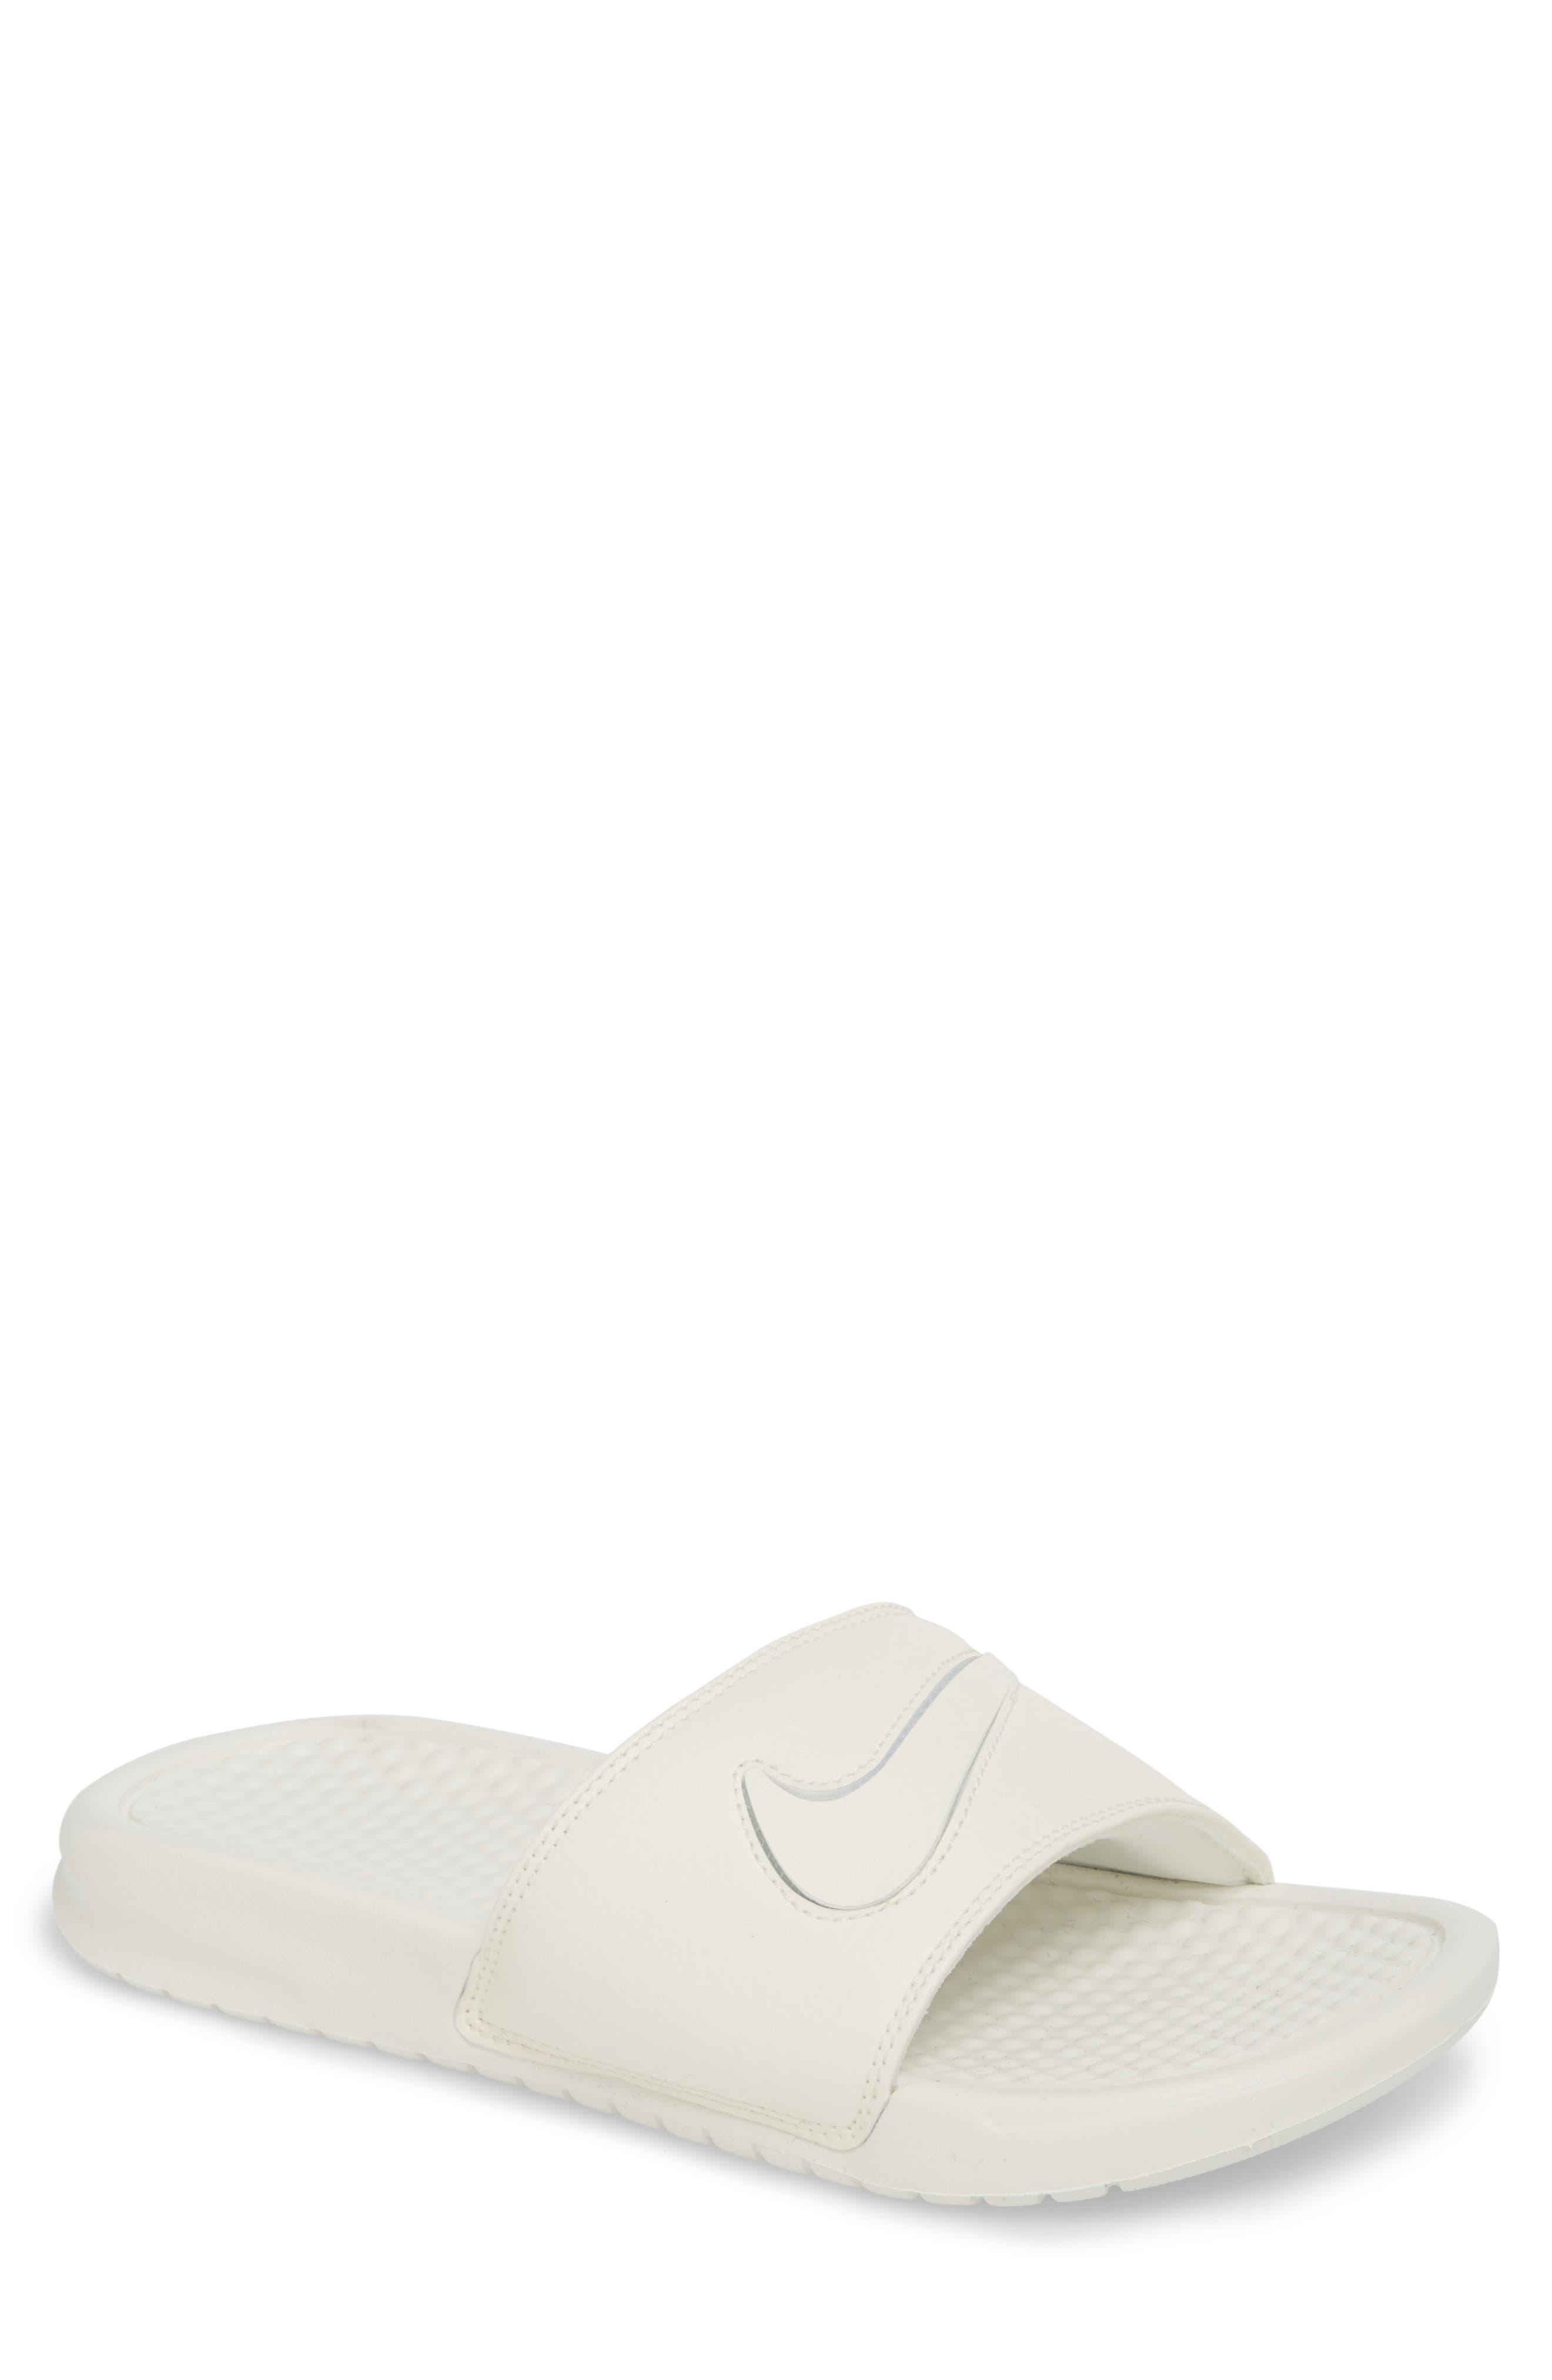 Nike Benassi JDI Customizable Slide Sandal (Unisex)